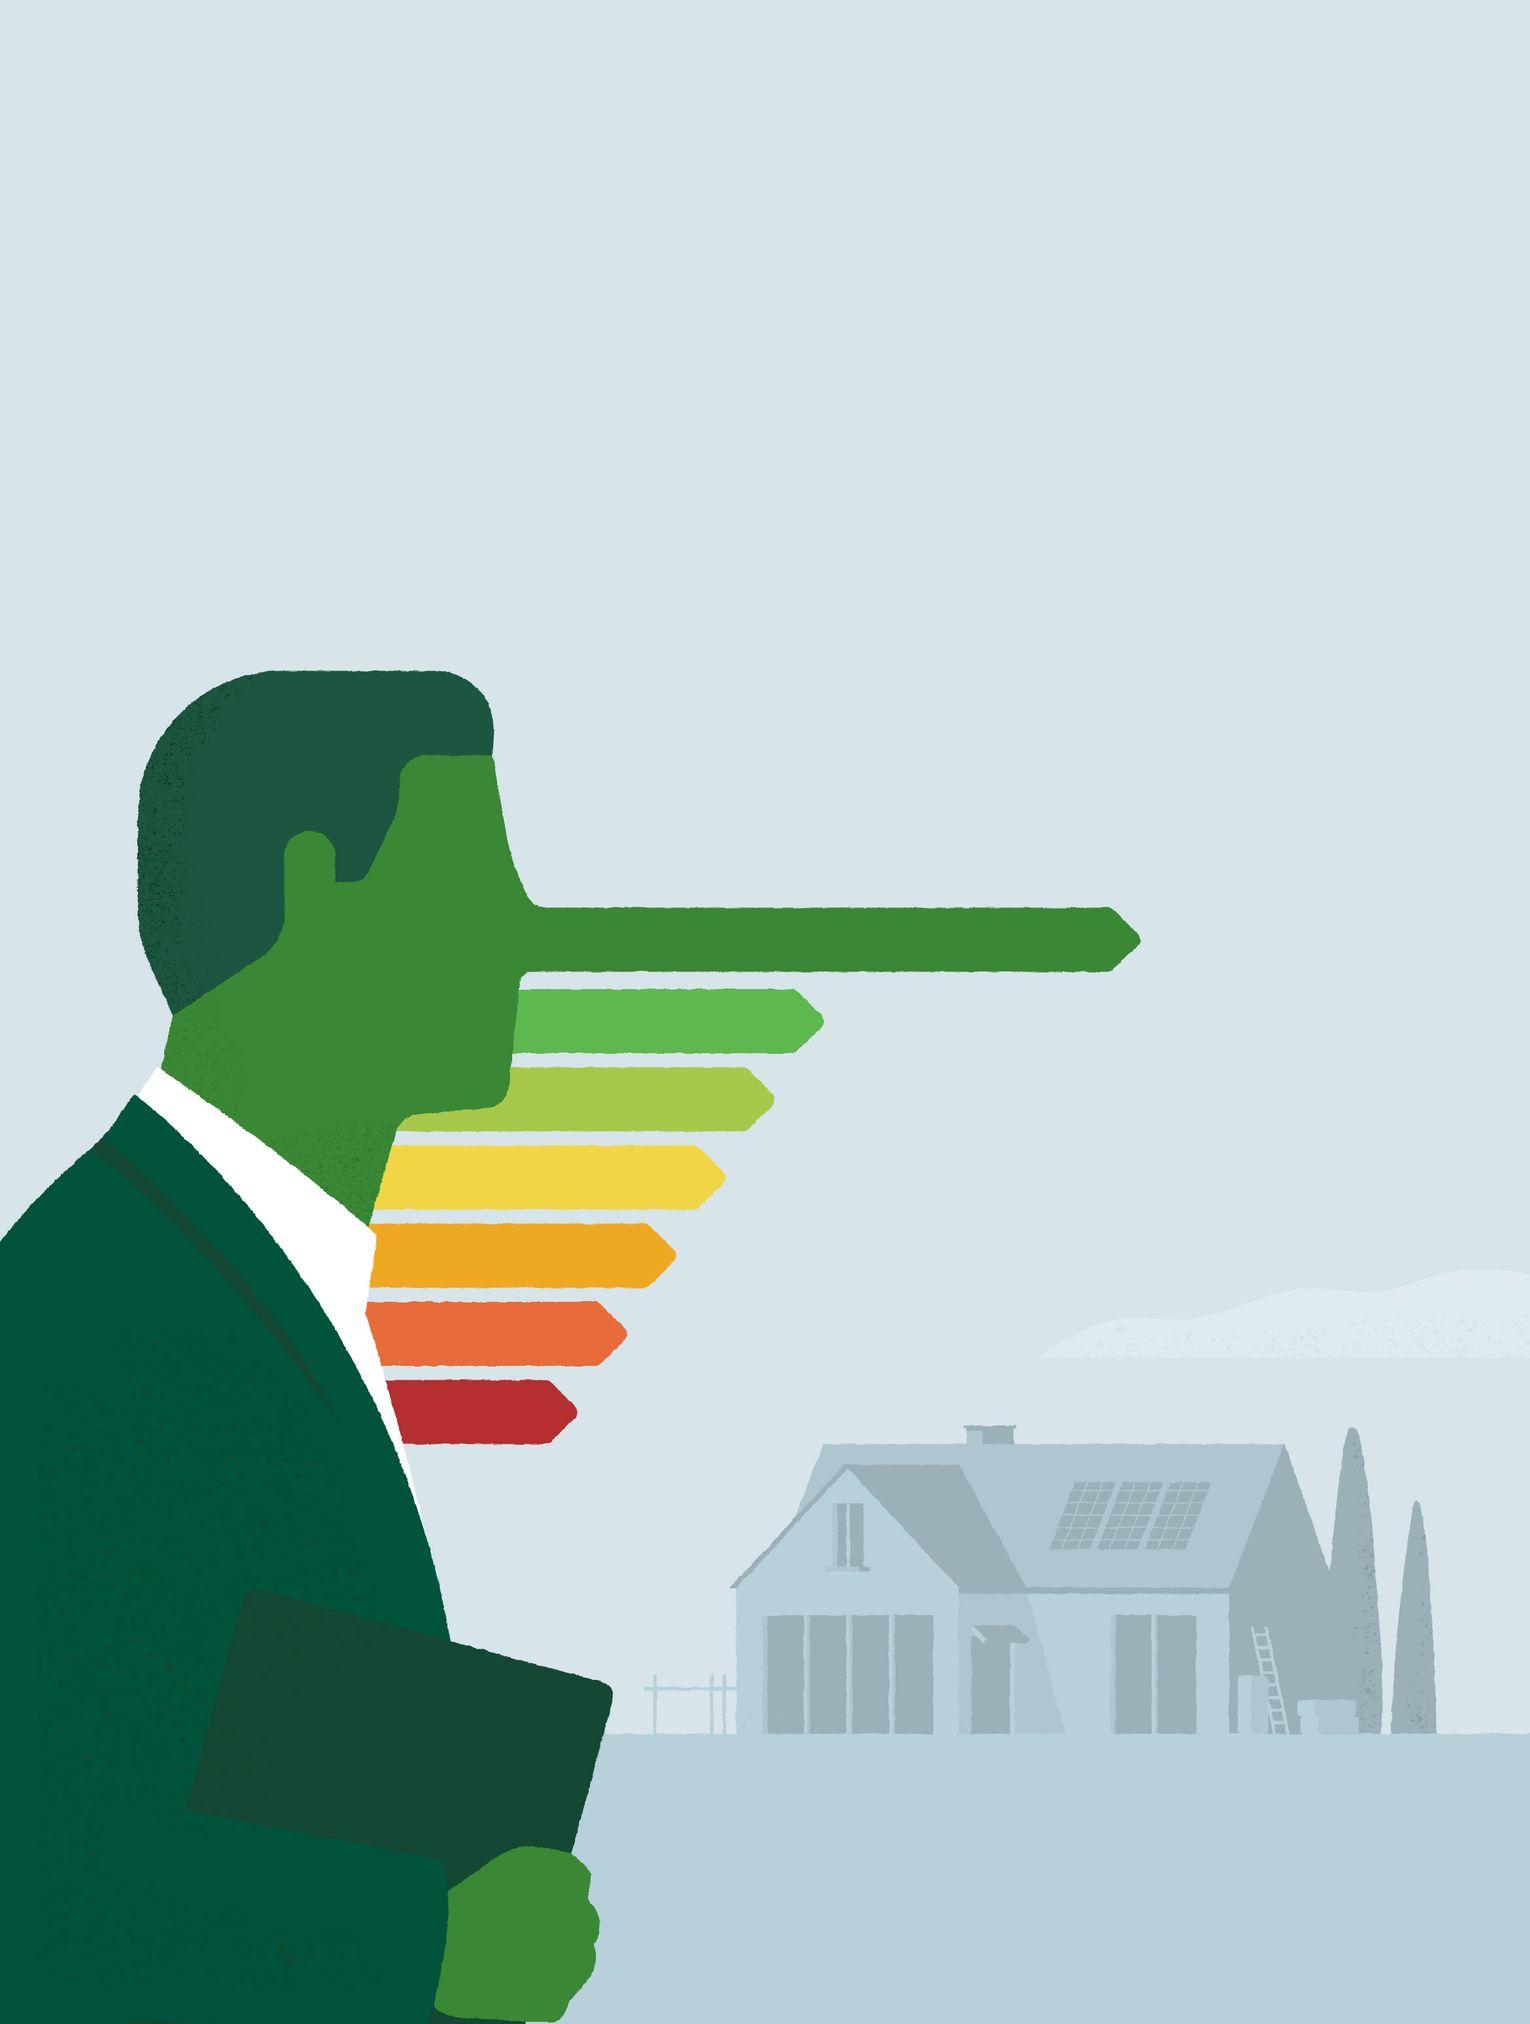 garance-illustration-Le-Particulier-Energy-renovation-scams_web